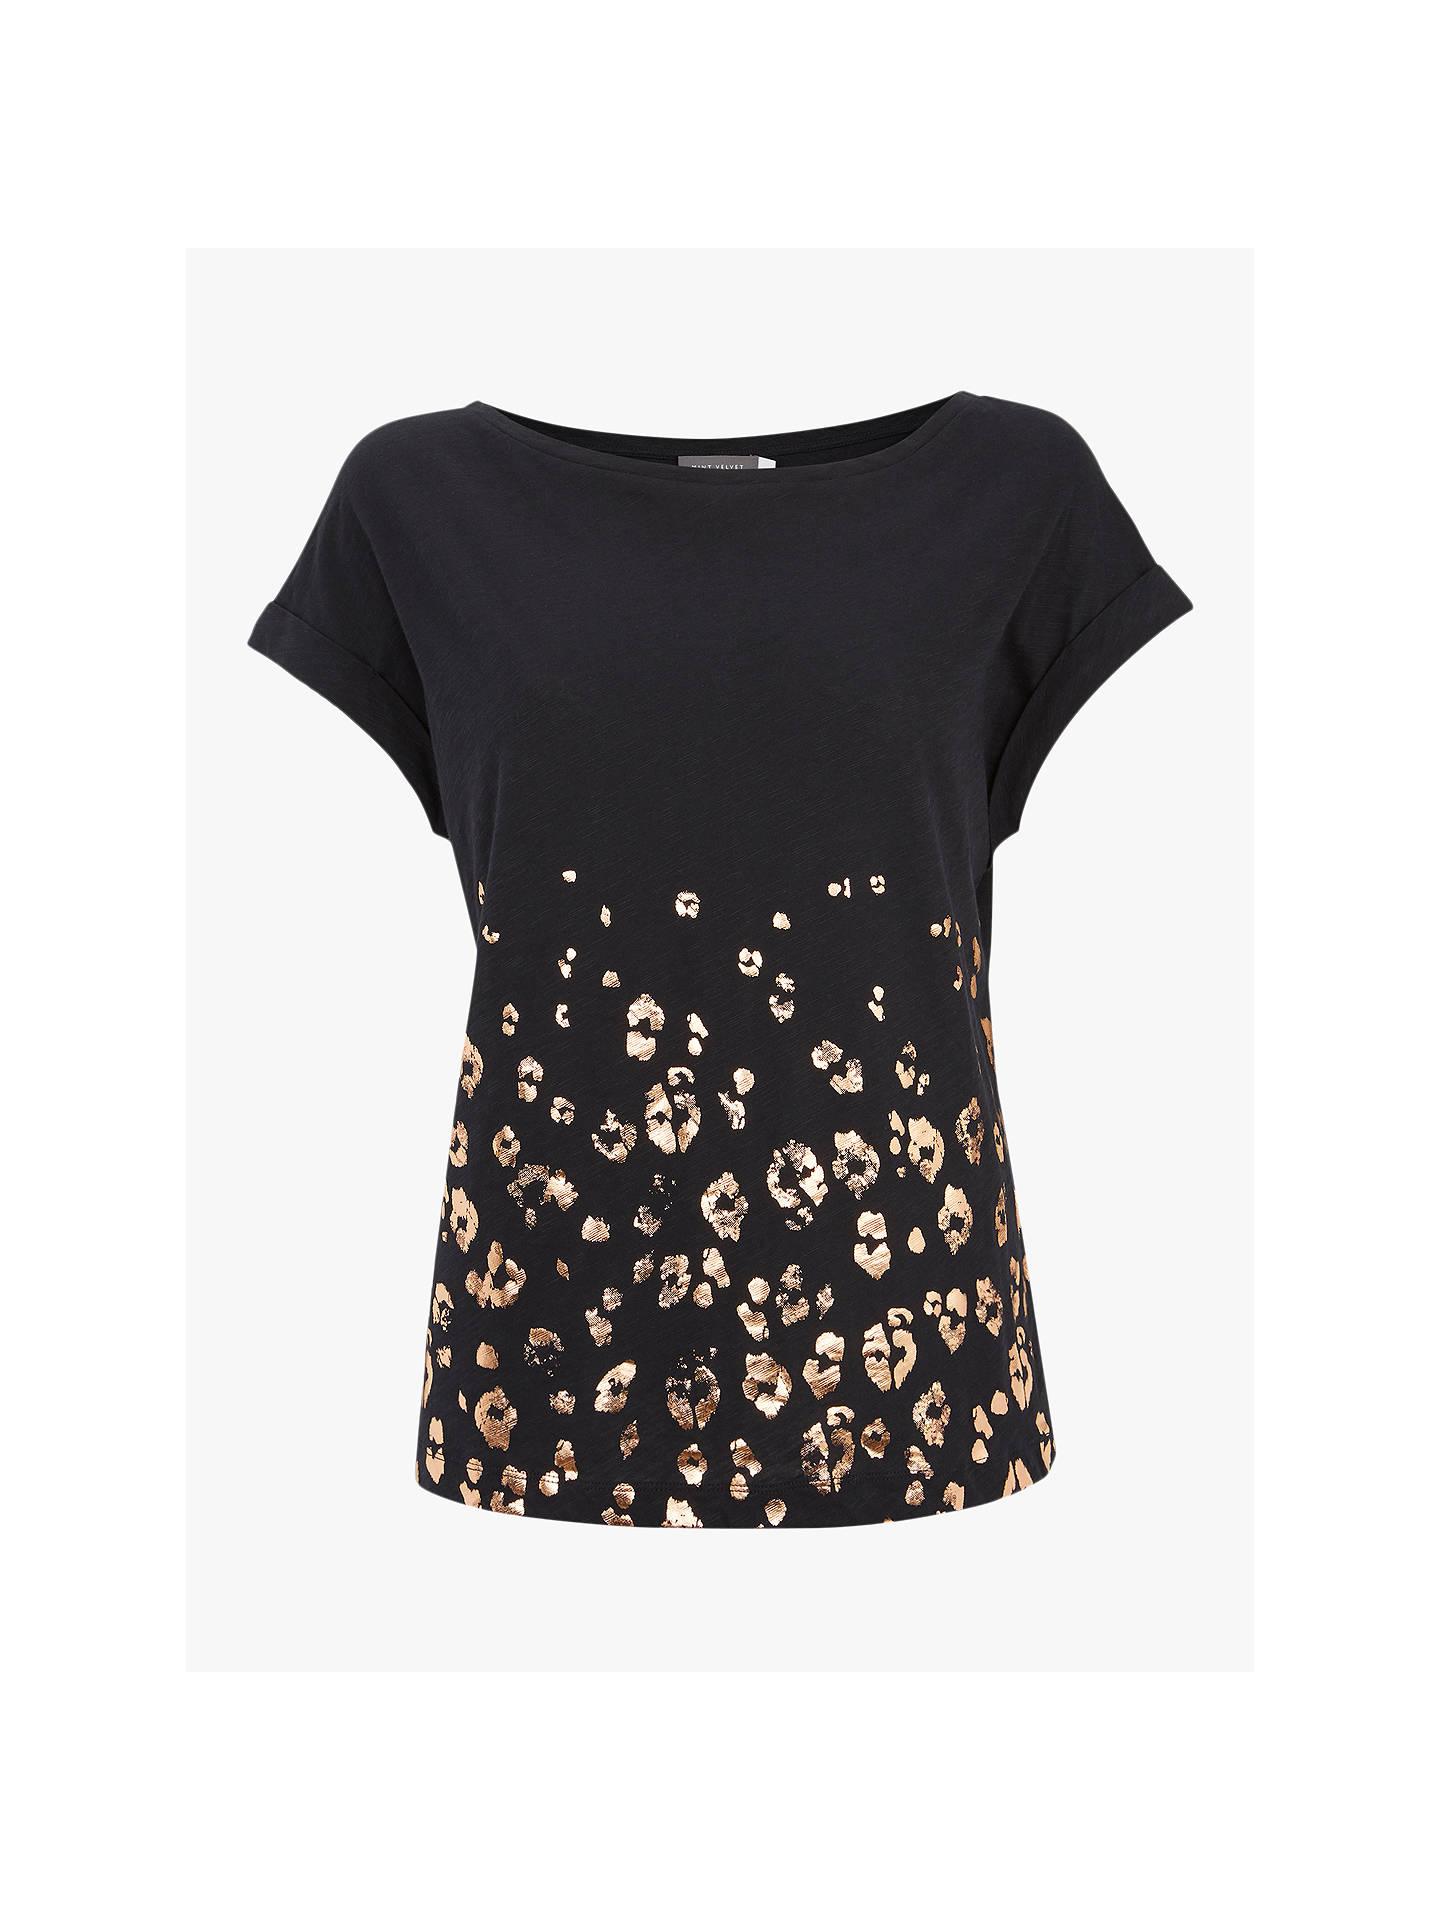 866d73b50ab4 ... Buy Mint Velvet Leopard Print T-Shirt, Dark Blue, L Online at johnlewis  ...